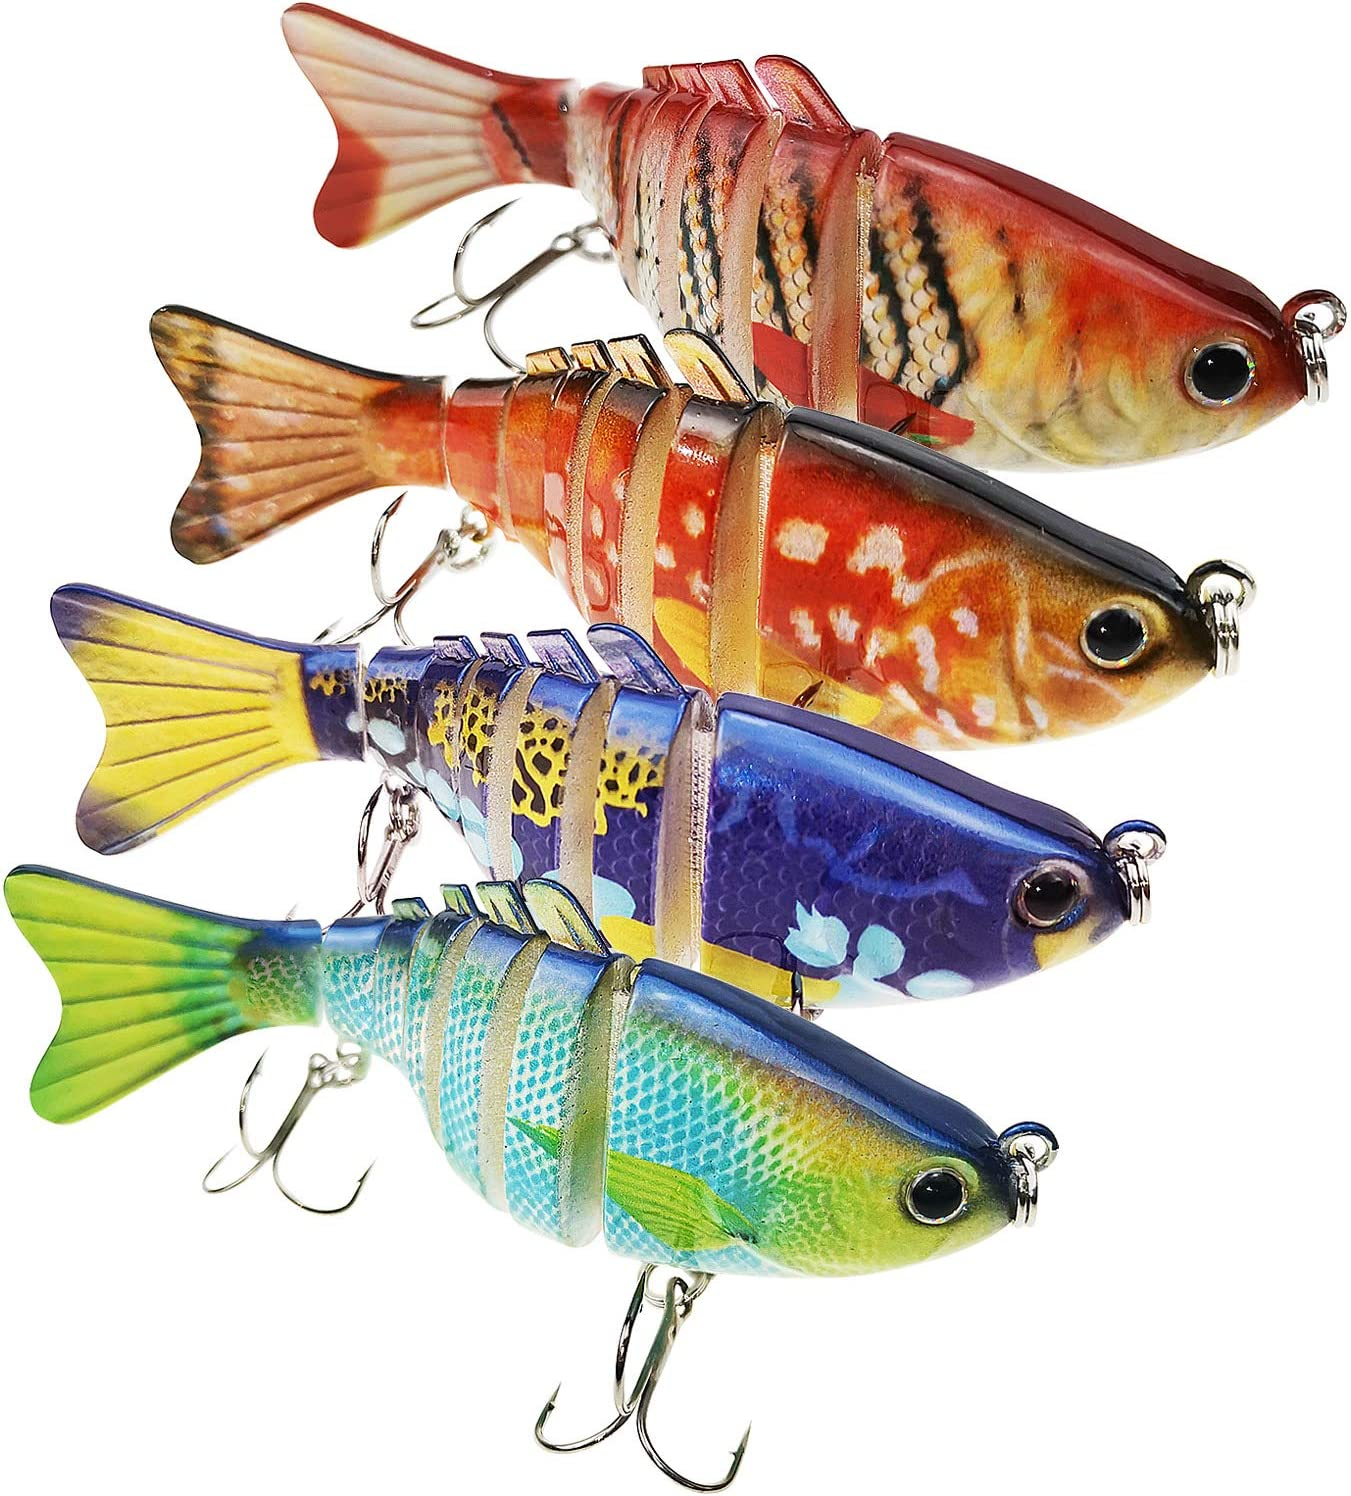 4pcs Colorful Mini Fishing Lures CrankBaits Slow Sinking Rattles Paxipa